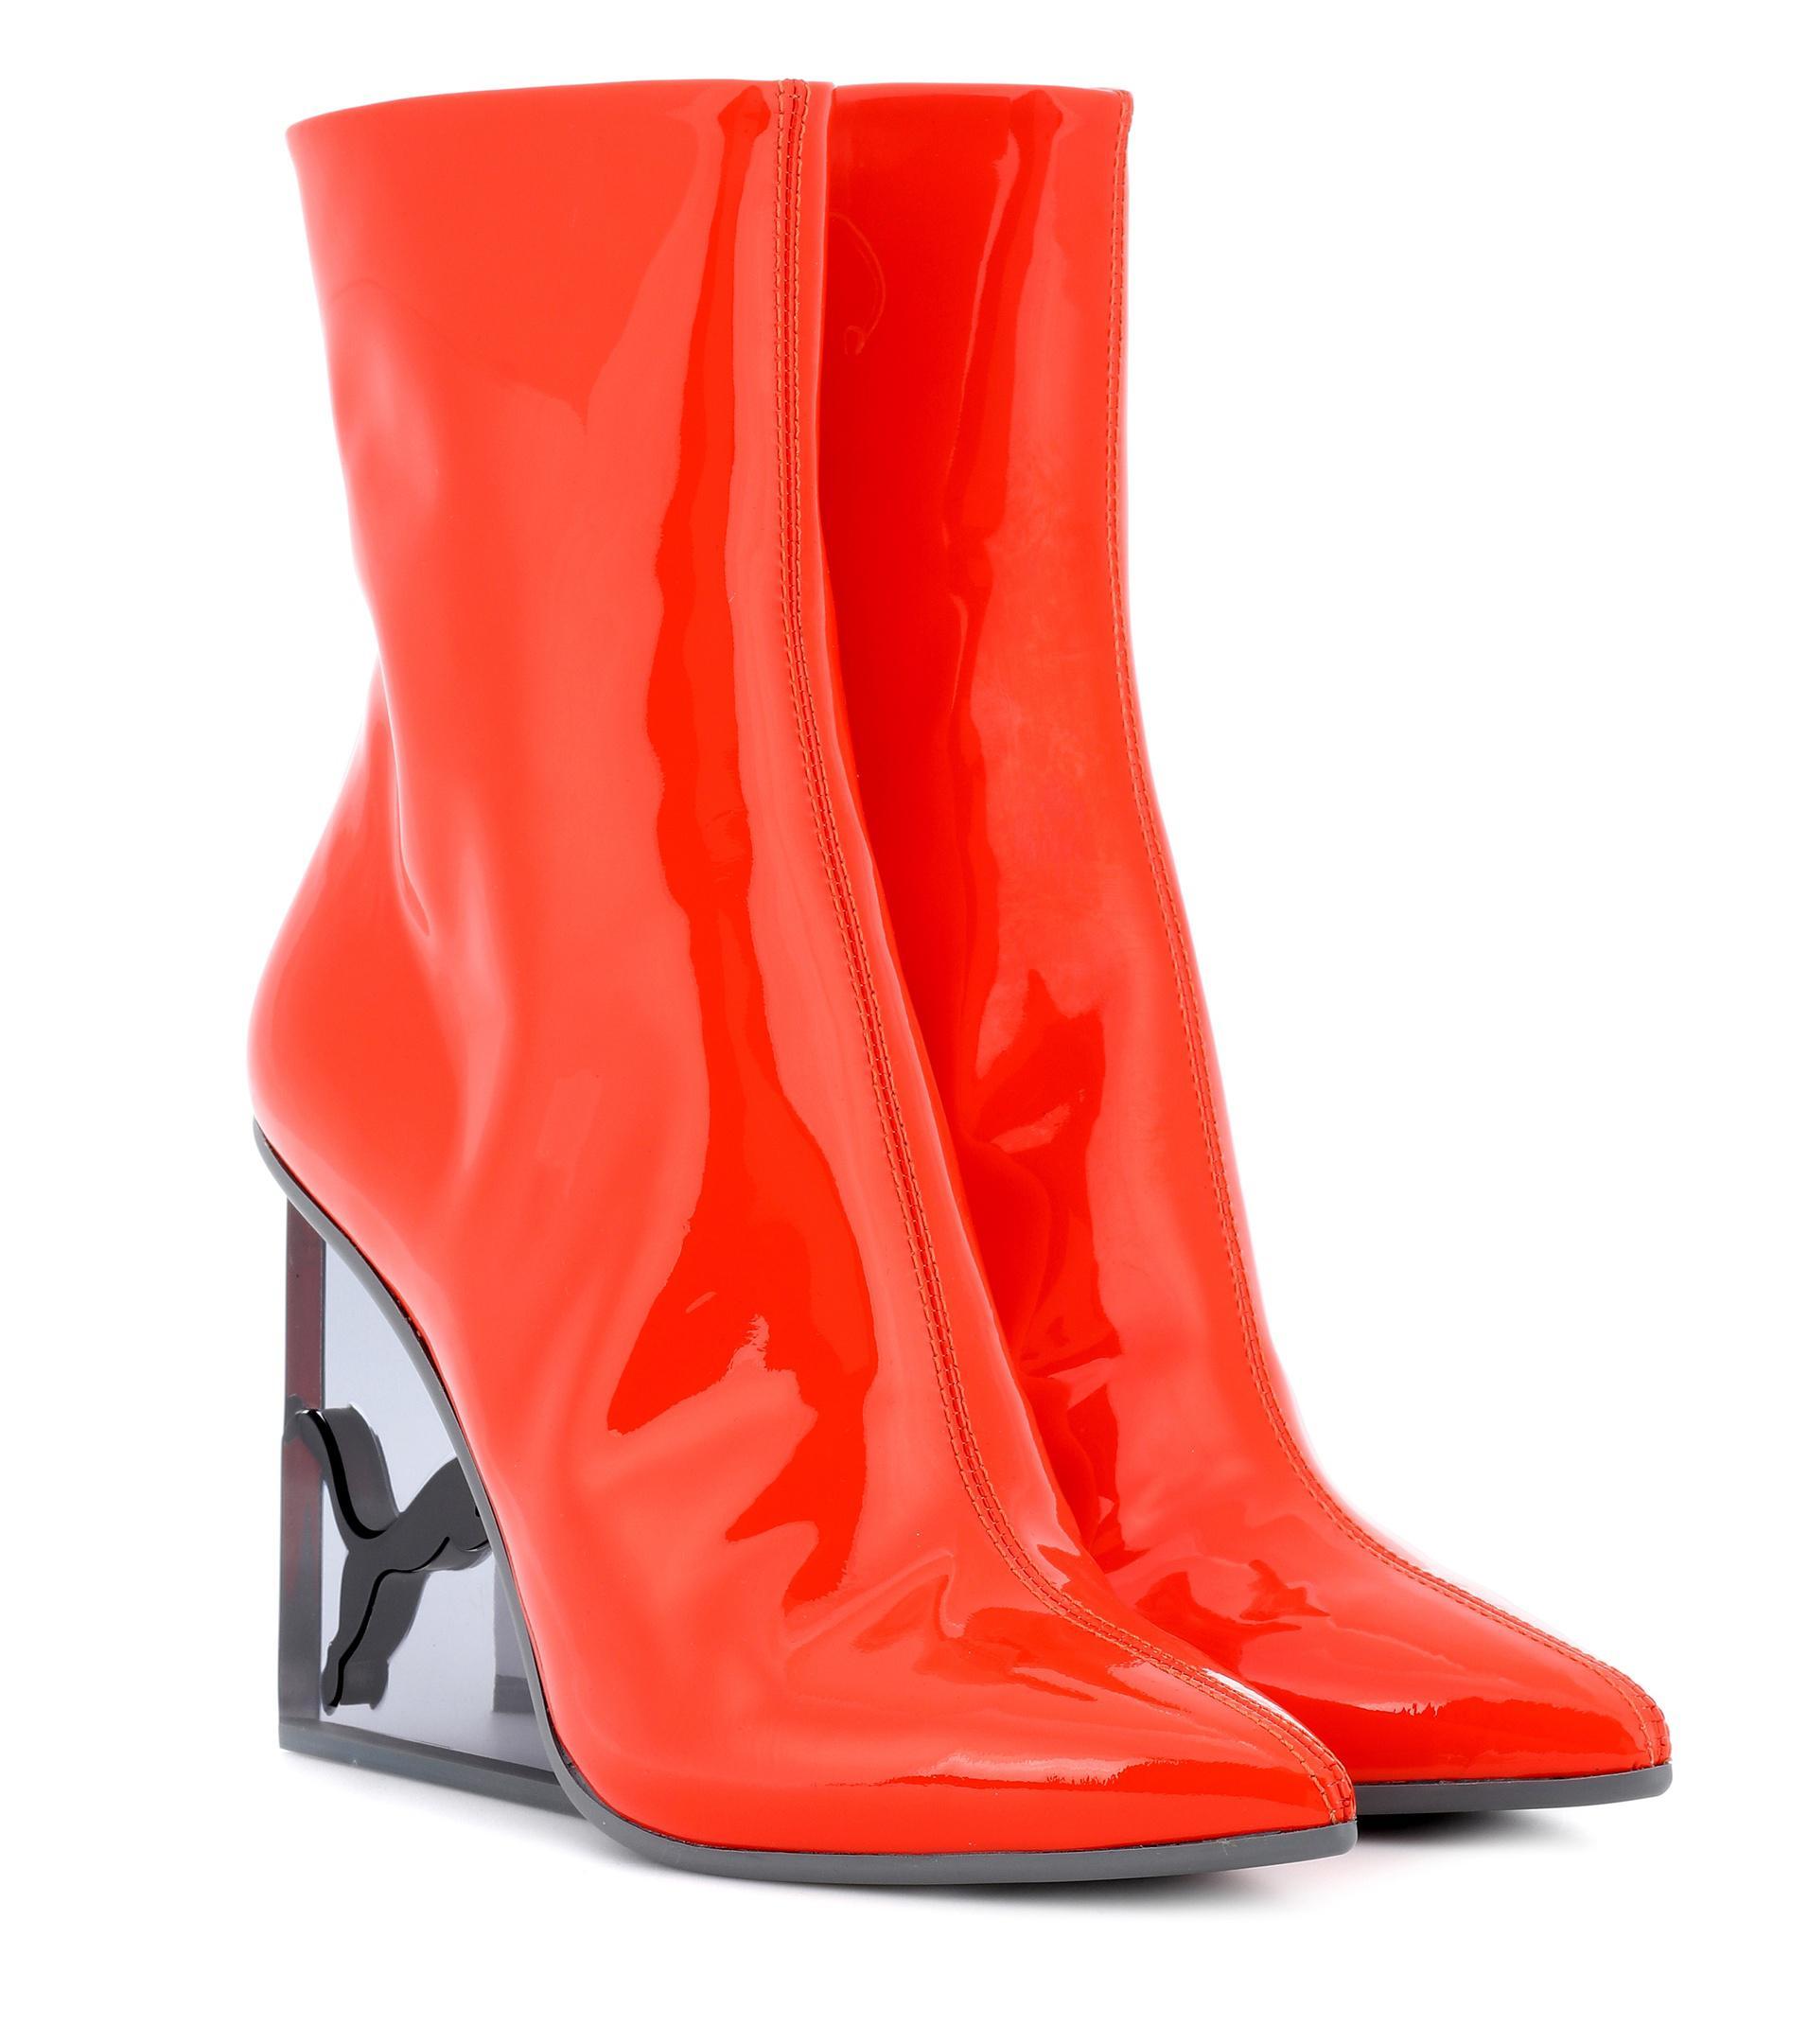 magasin en ligne 18f1b ff365 Bottines en cuir verni femme de coloris orange